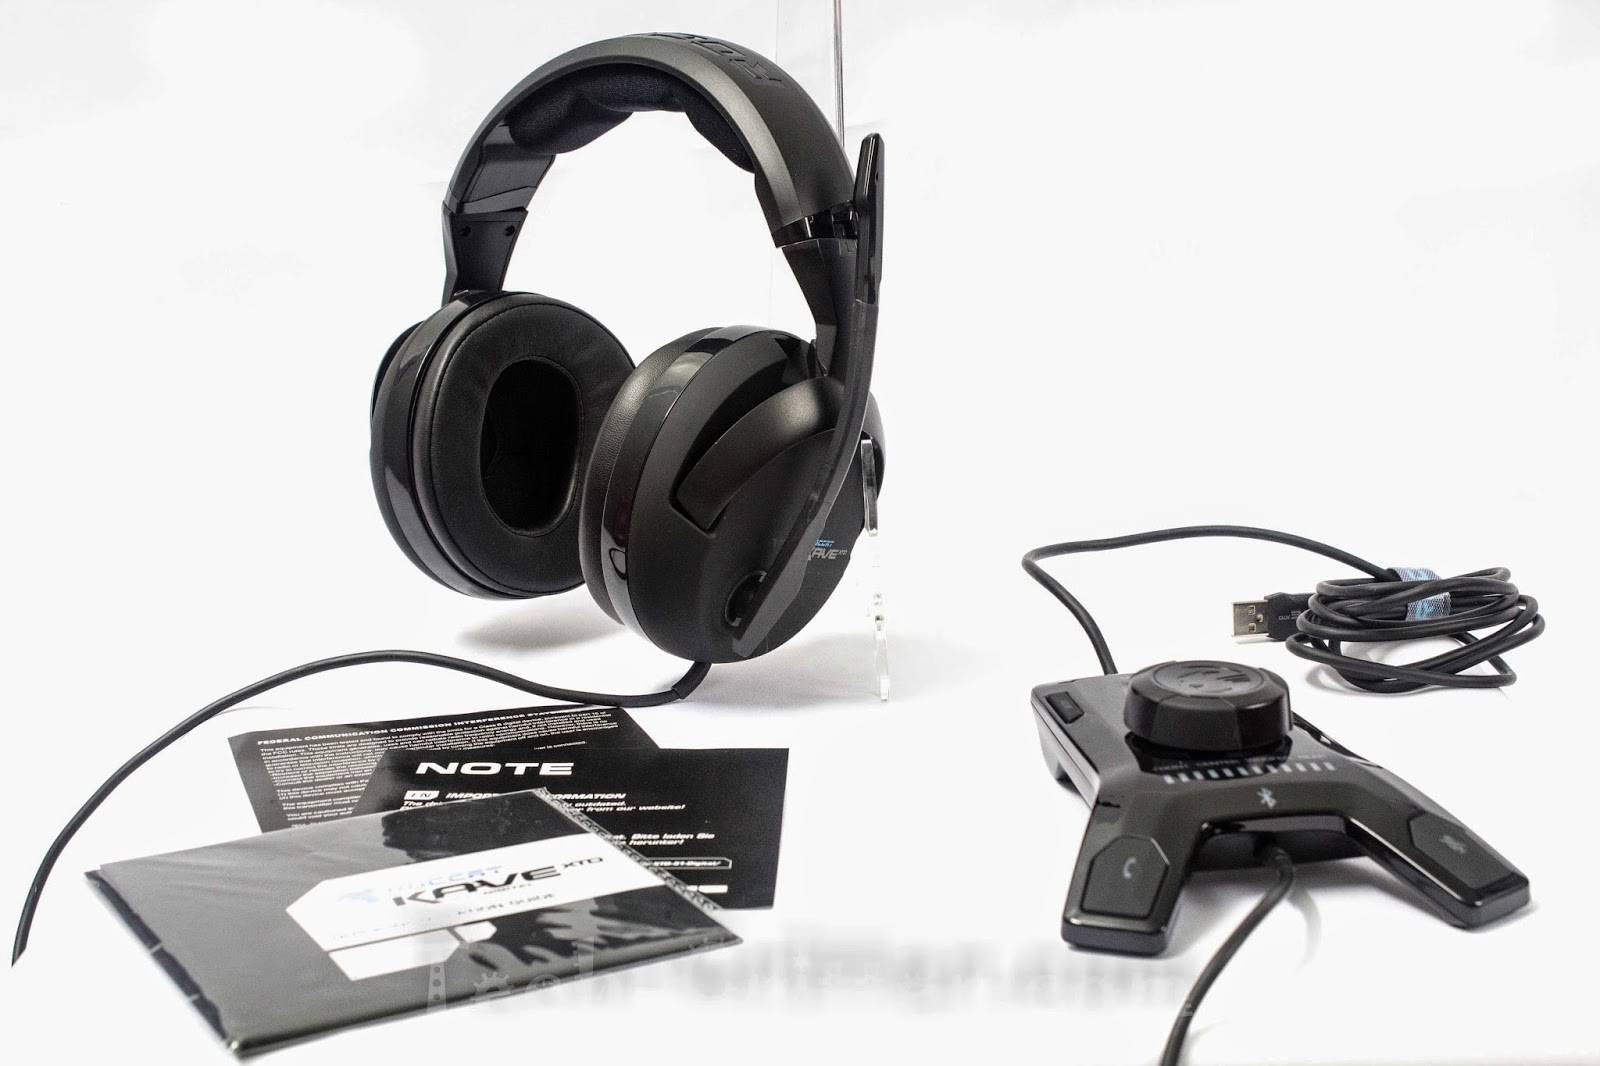 Unboxing & Review: Roccat Kave XTD 5.1 Digital Surround Sound Headset 58